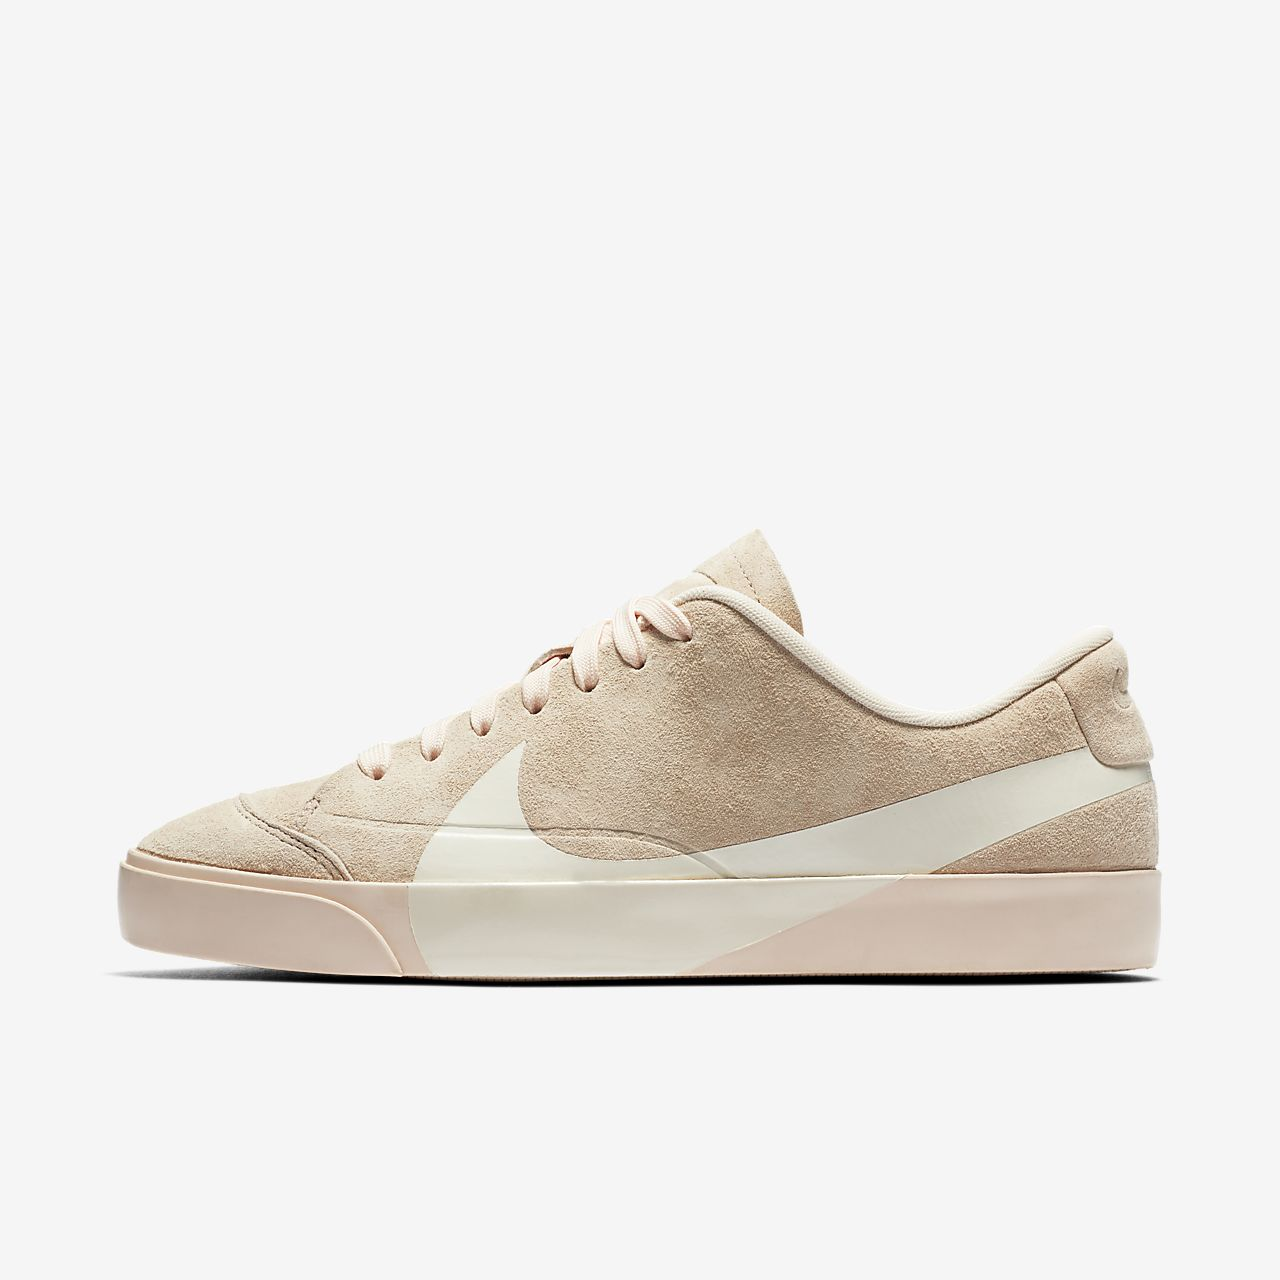 pretty nice faef1 6f0d0 Chaussure Nike Blazer City Low LX pour Femme